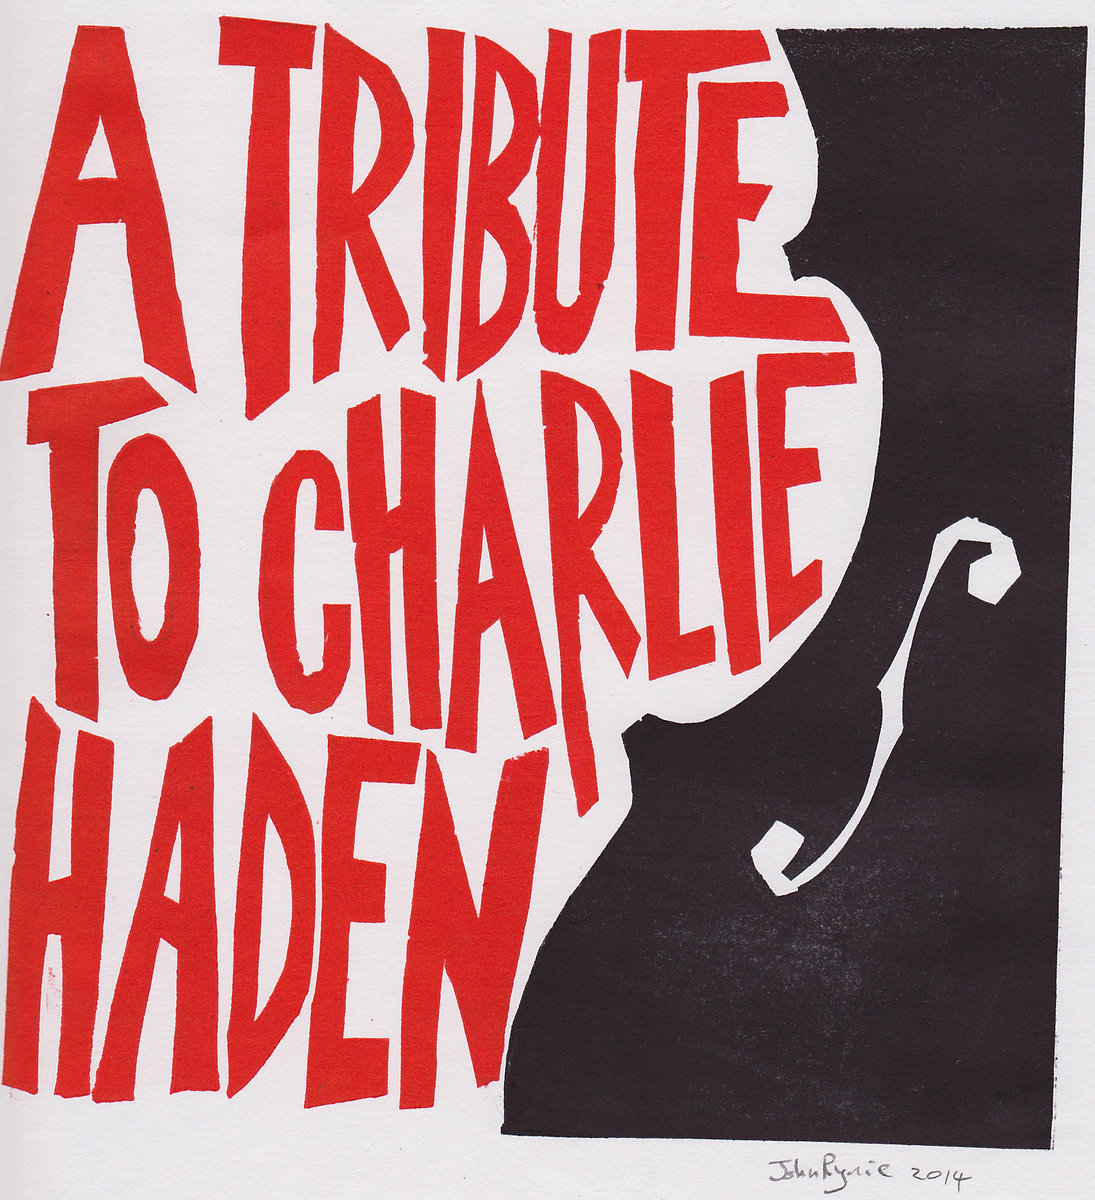 Charlie Haden.jpg